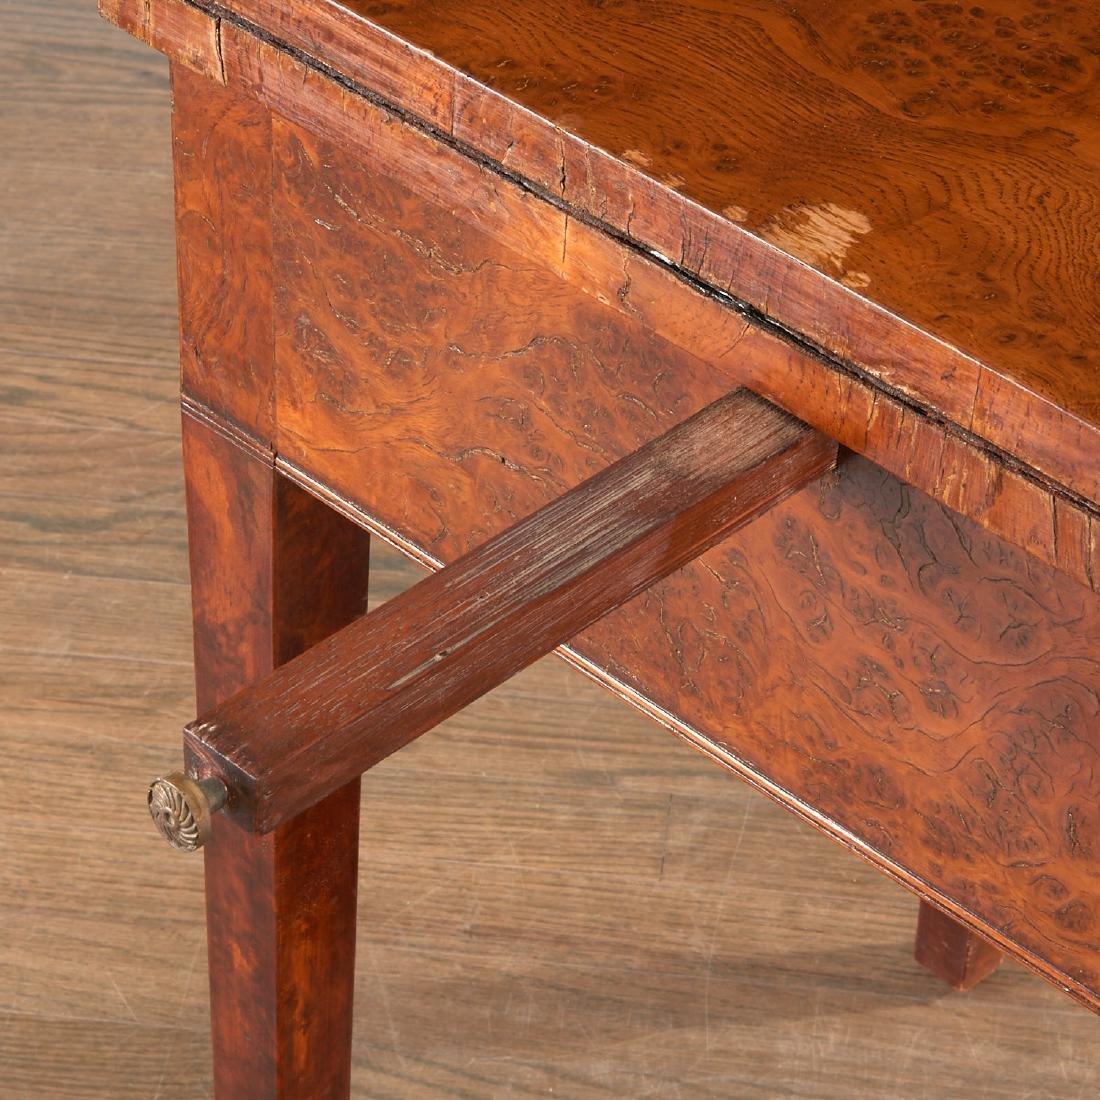 Antique Hepplewhite writing table - 4